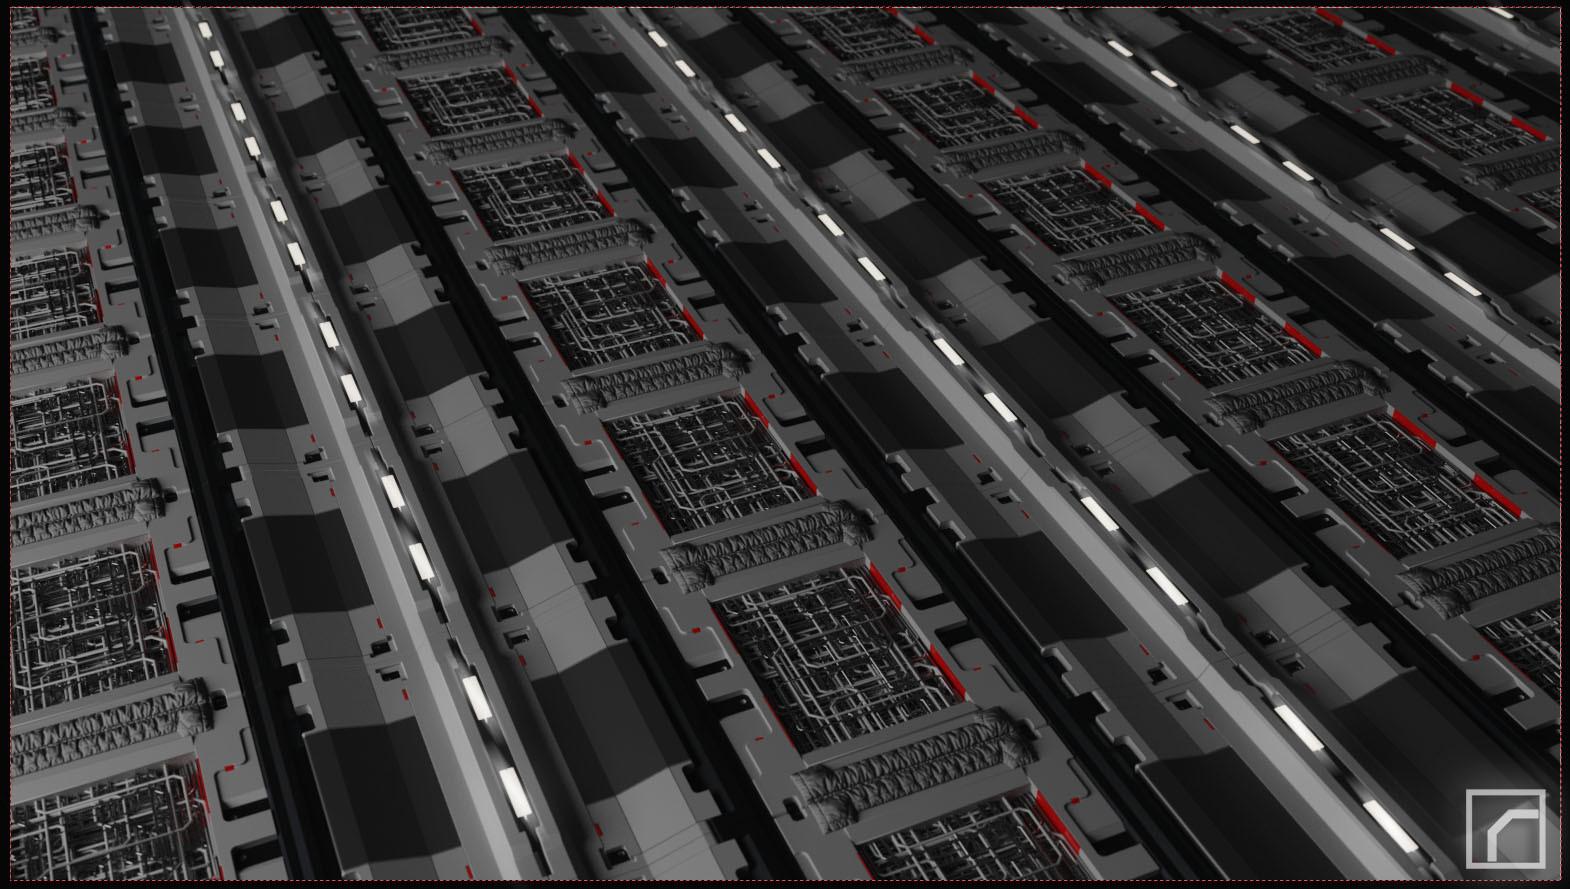 Jerry perkins mx1001 flooring